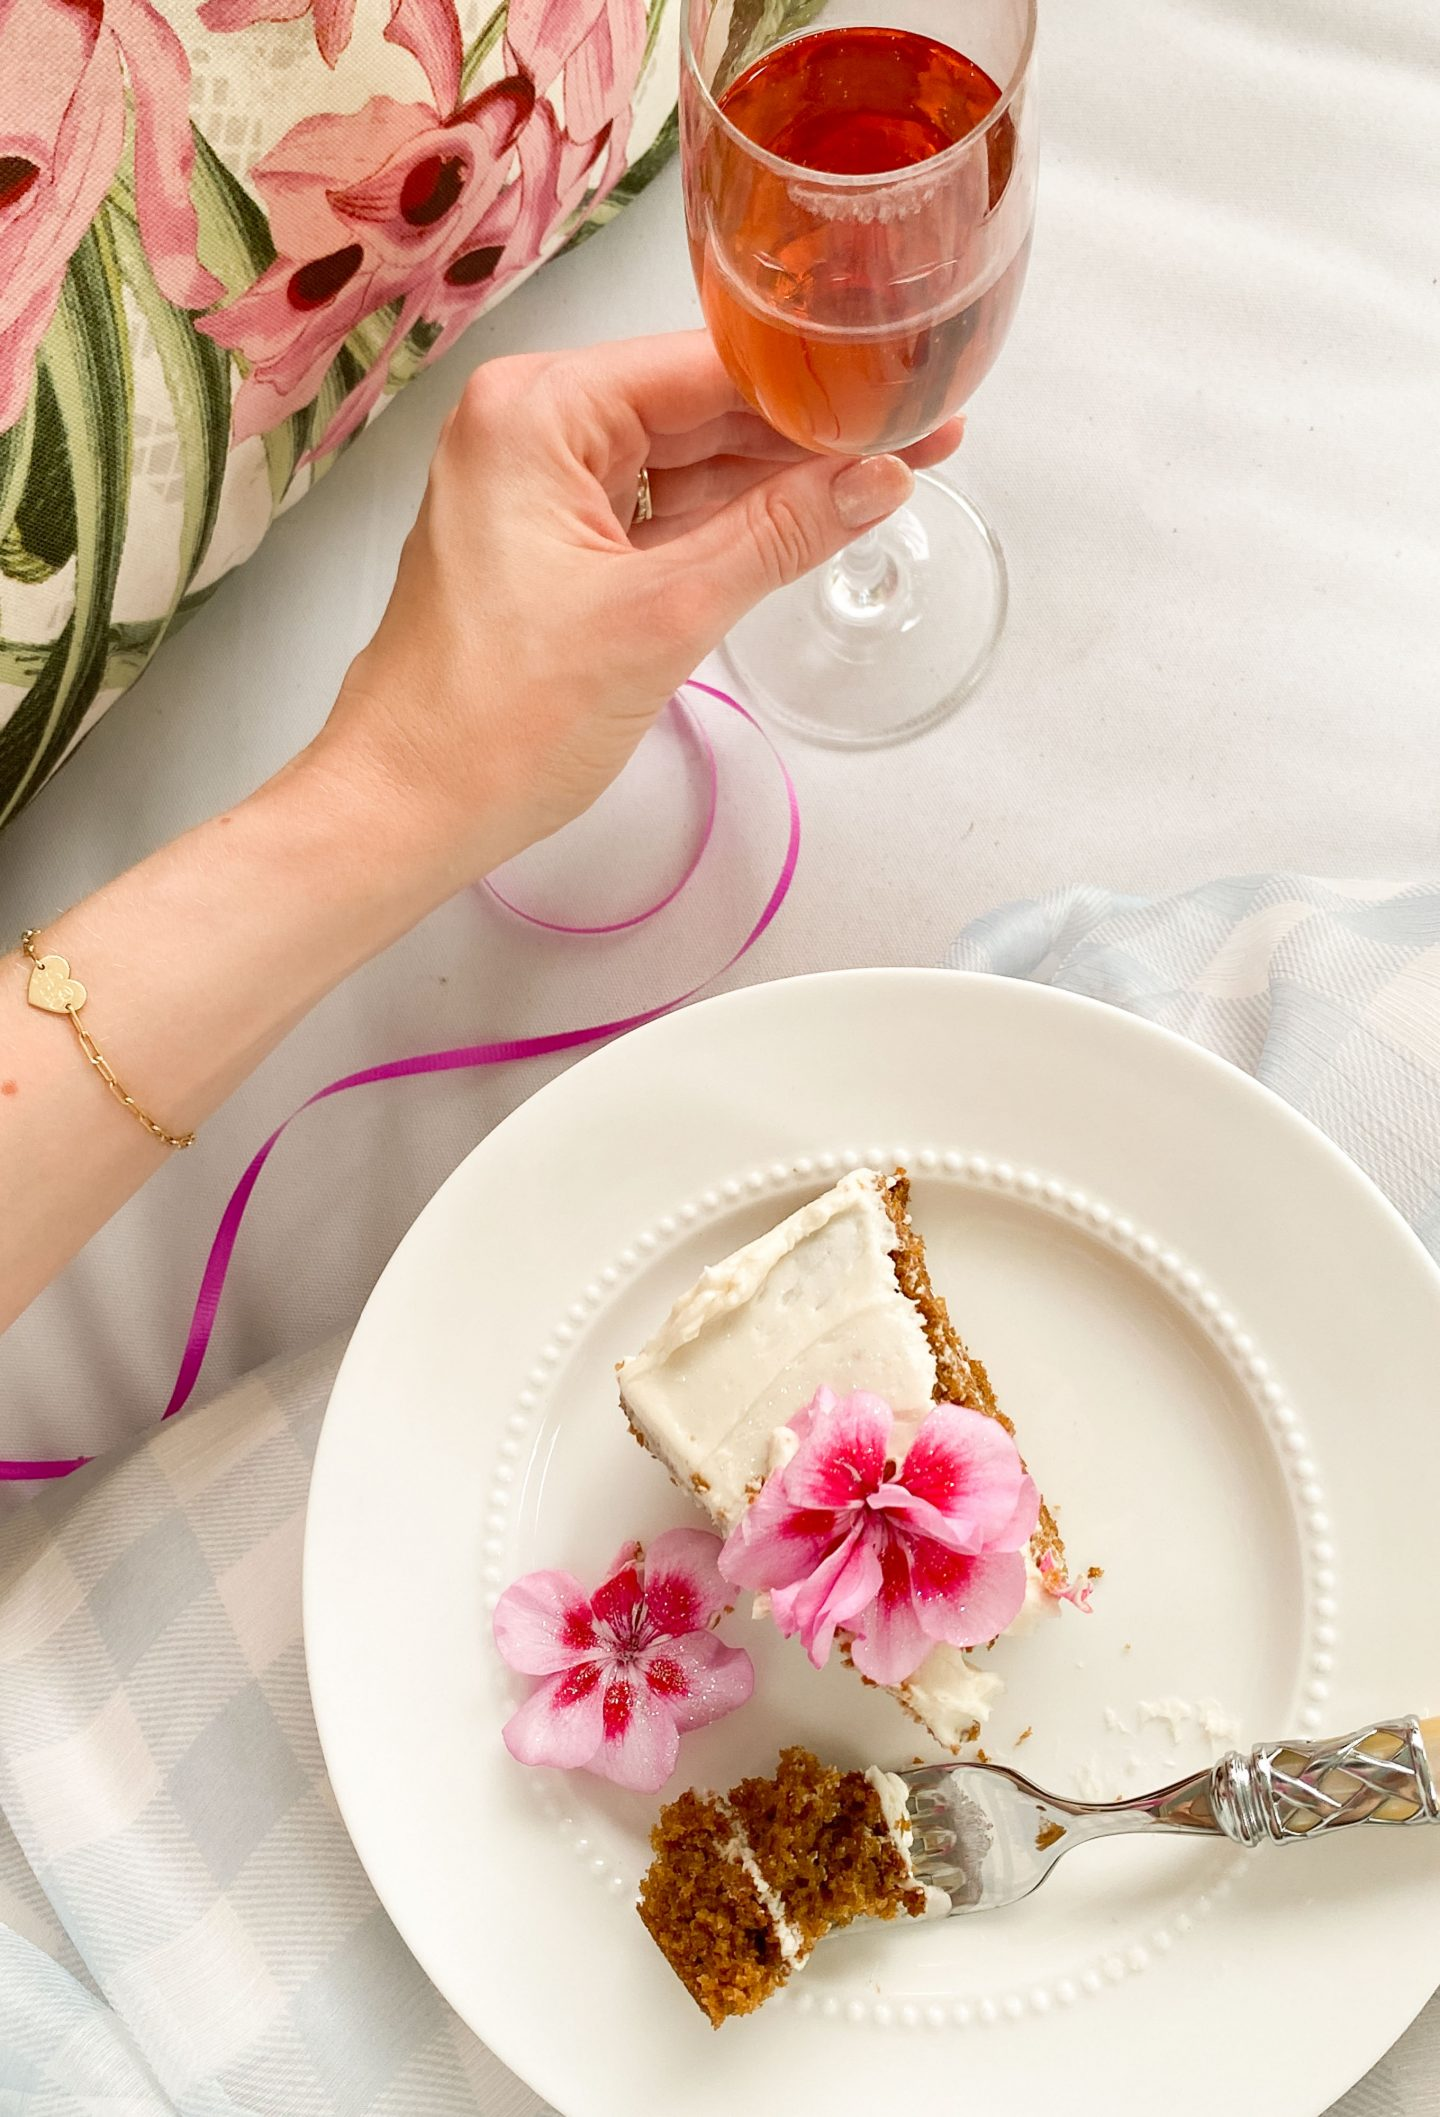 Champagne & Cake for Breakfast